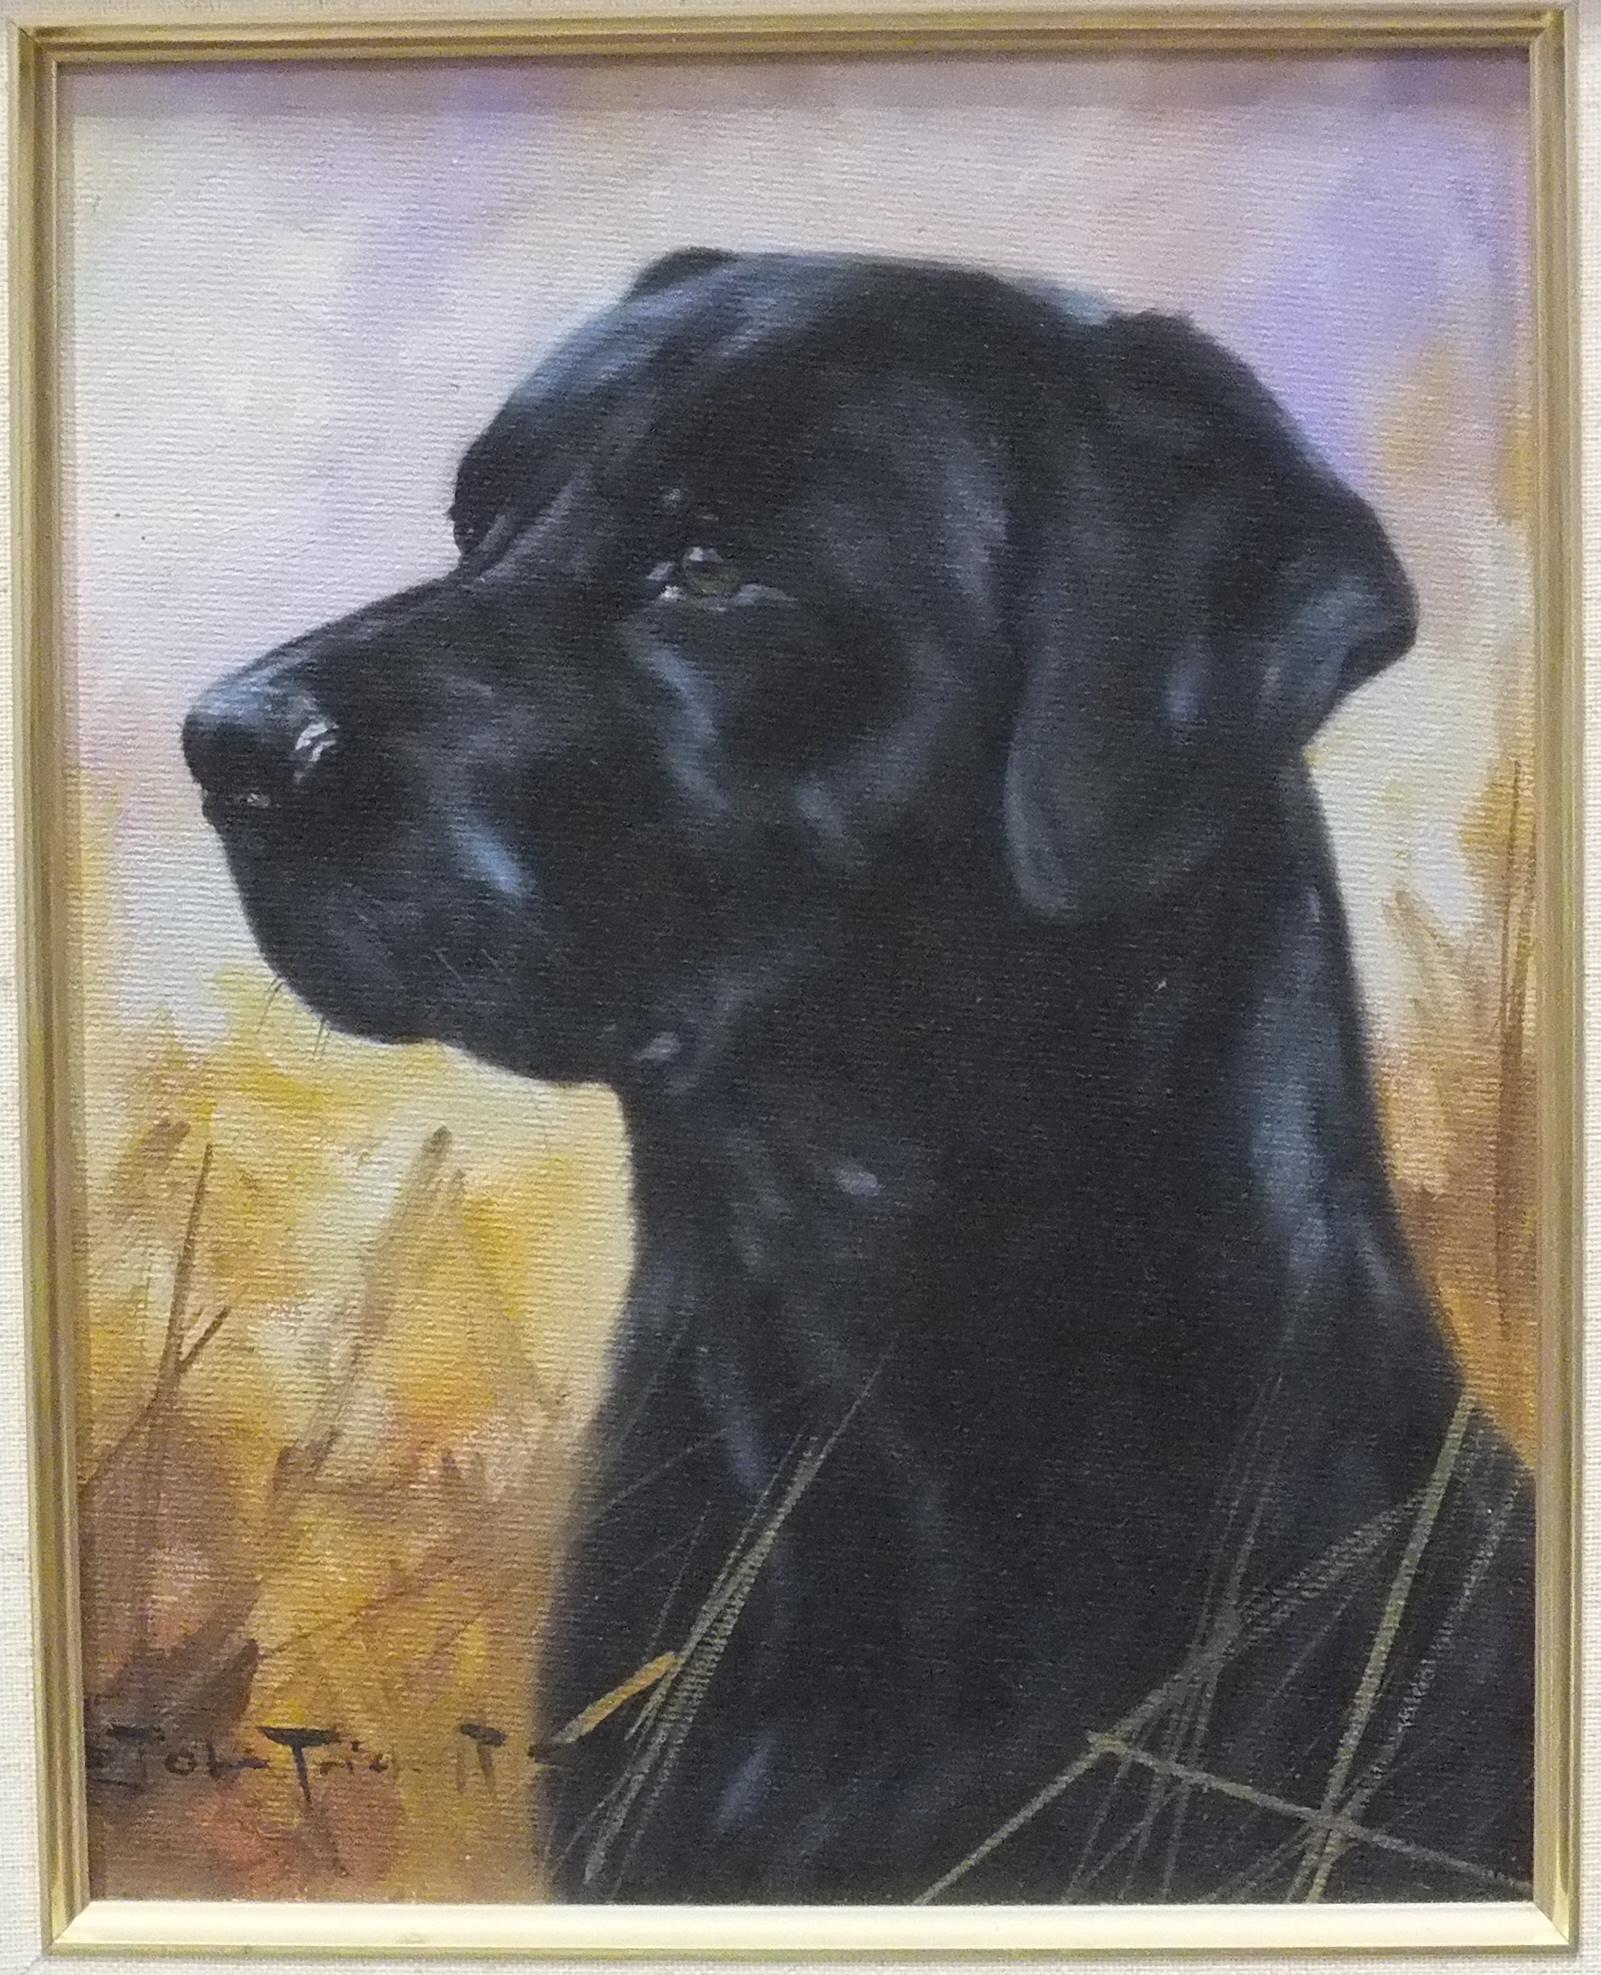 Lot 33 - John Trickett, 'Head and shoulders portrait of a black Labrador', signed oil on board, 24 x 19cm.